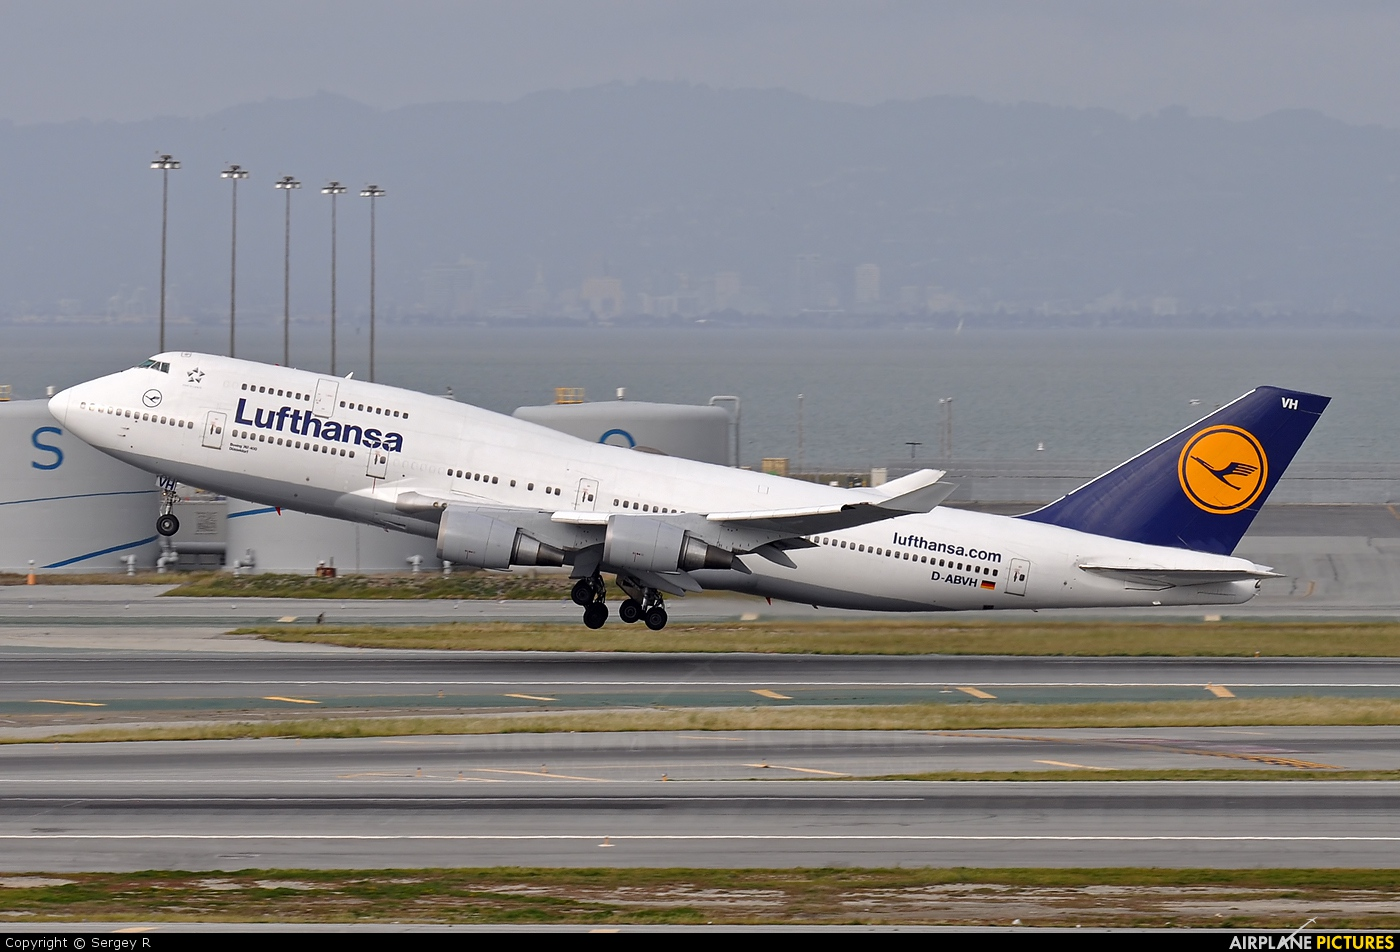 Lufthansa D-ABVH aircraft at San Francisco Intl